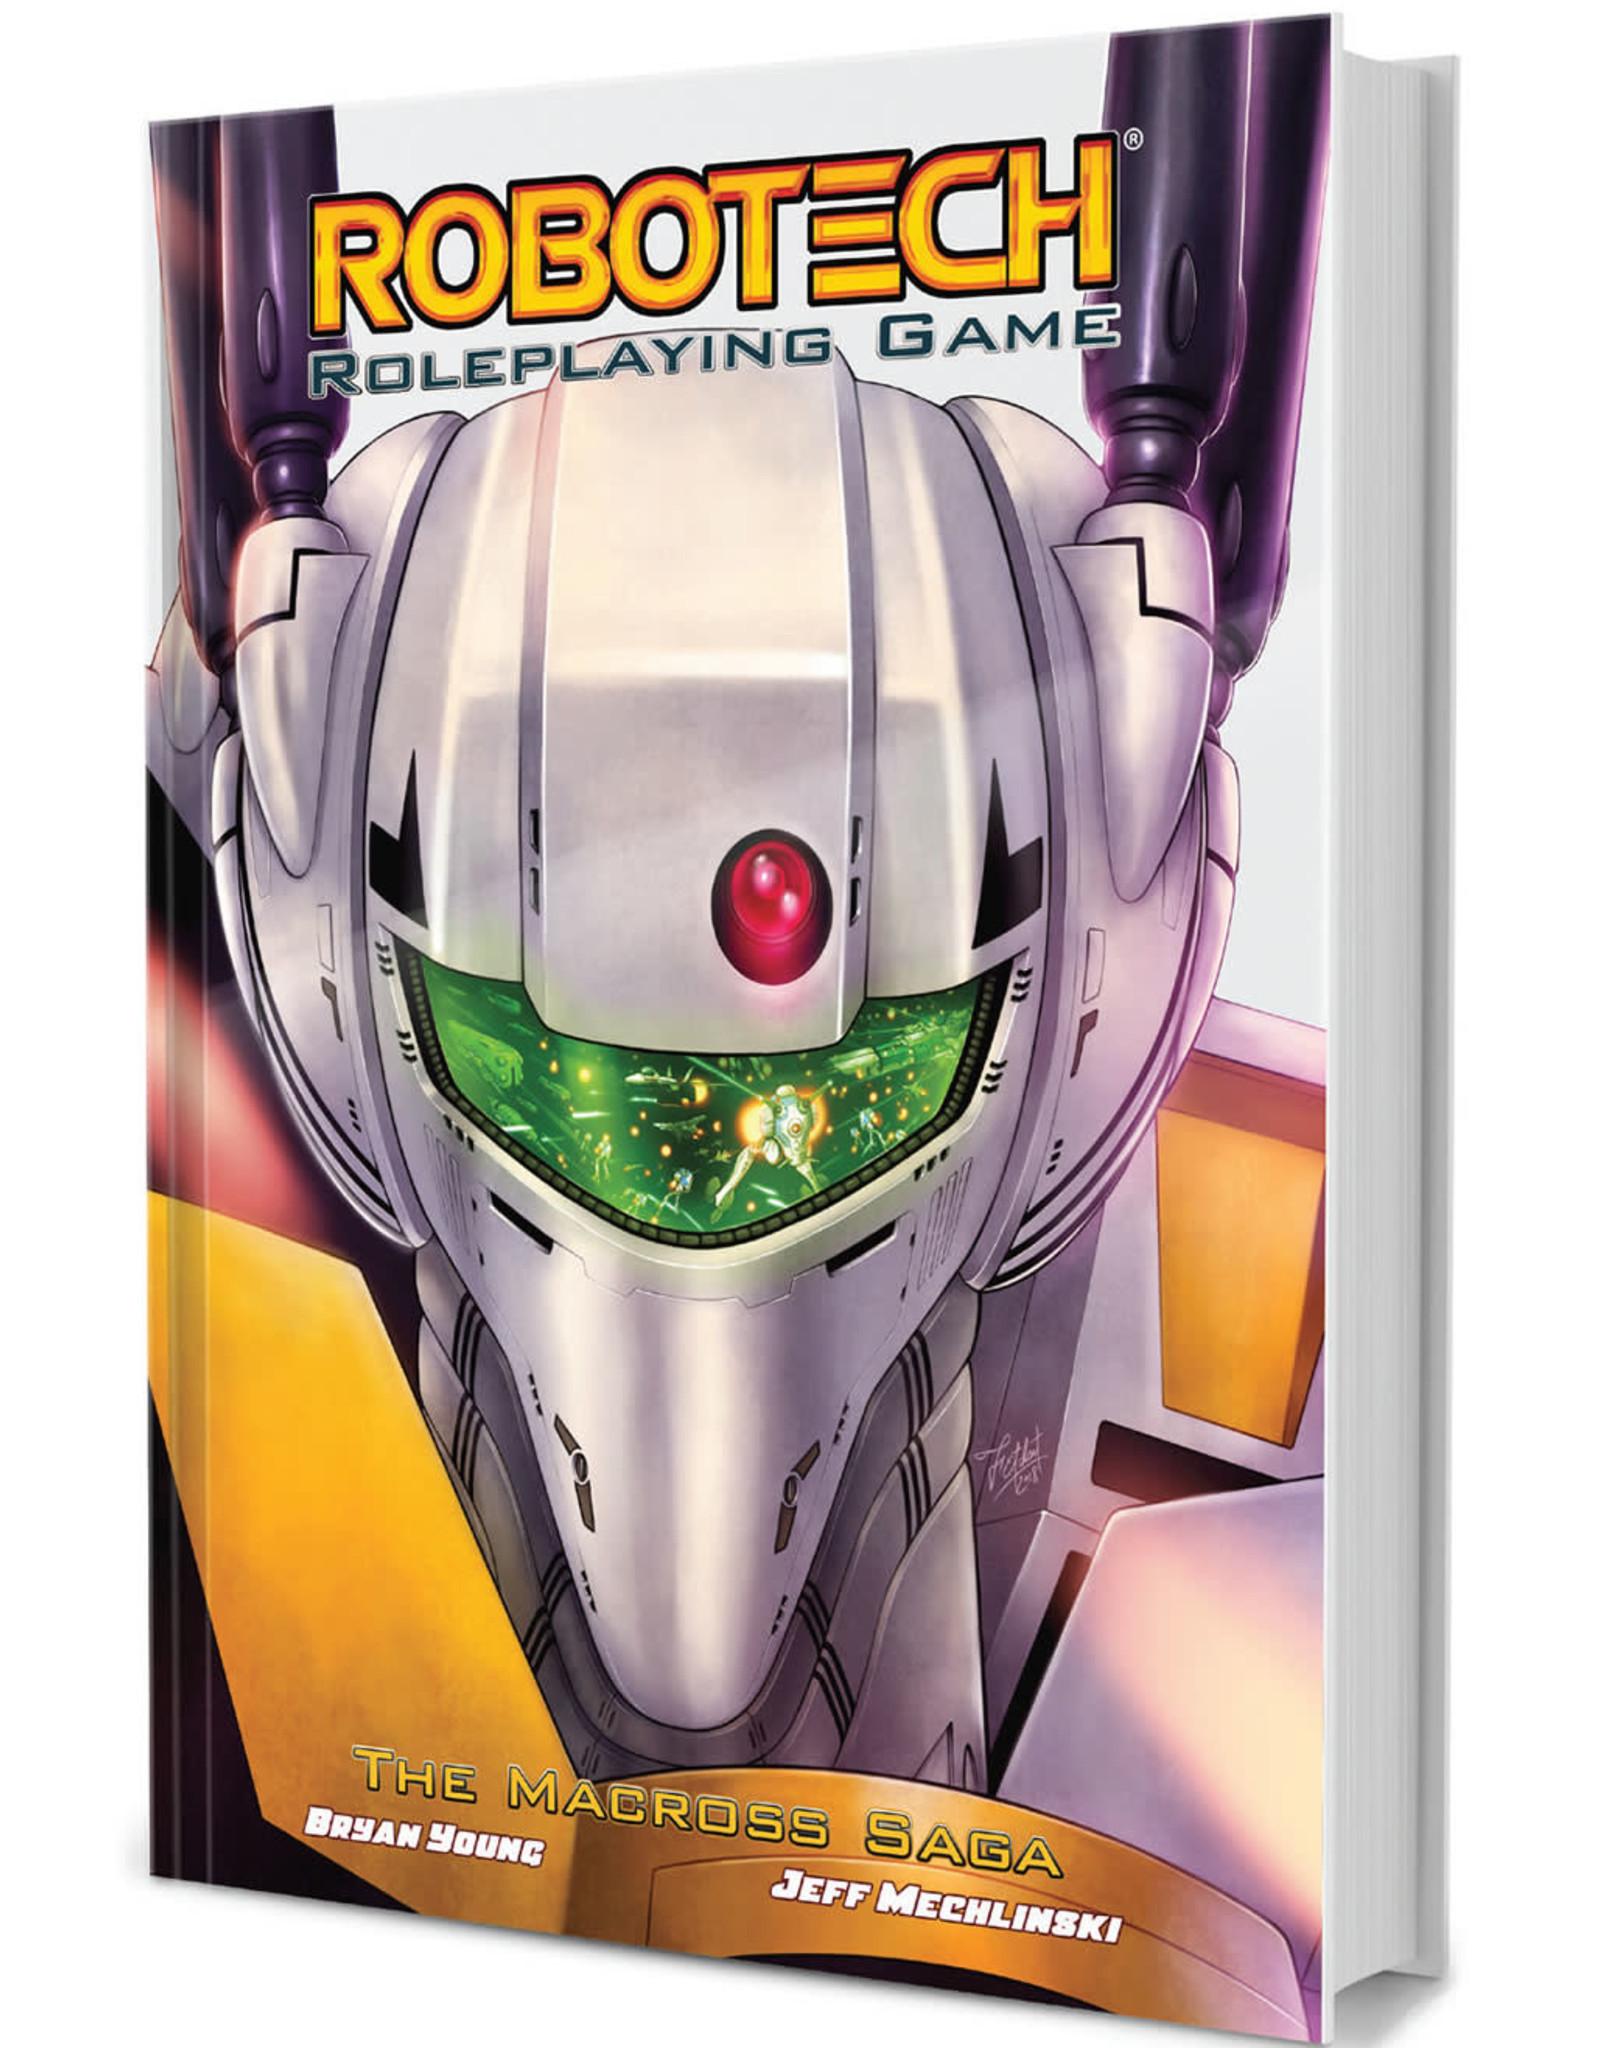 Robotech: The Macross Saga - Core Rulebook